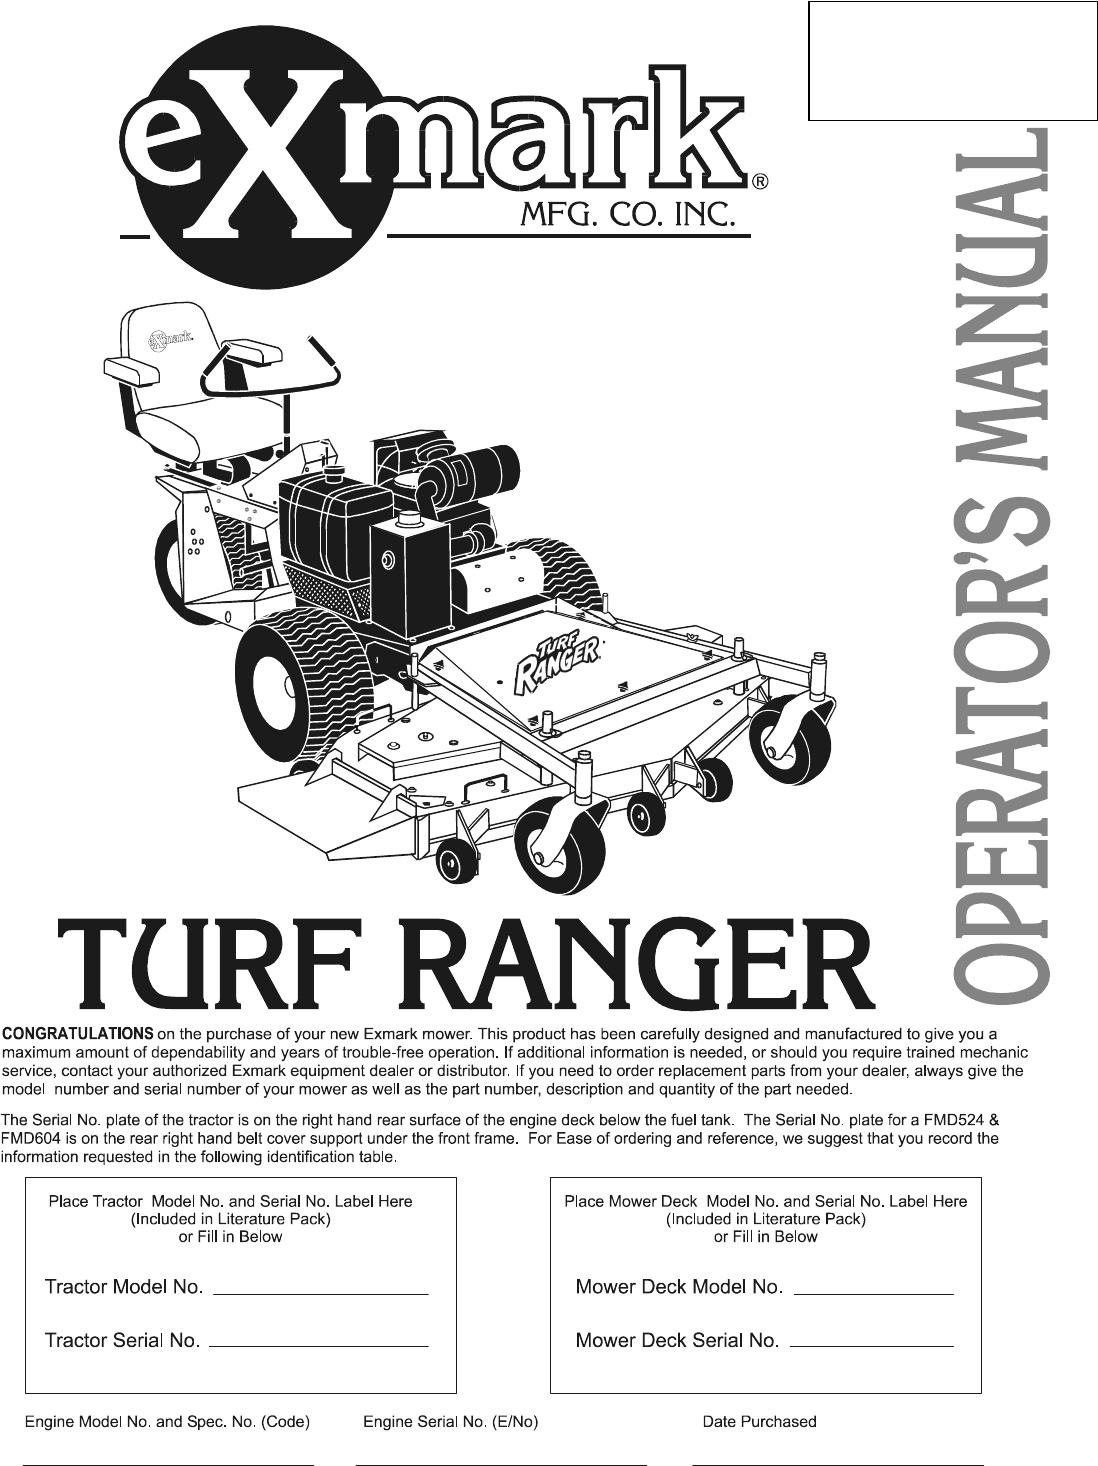 Exmark Tr23Kc Users Manual 103 9192